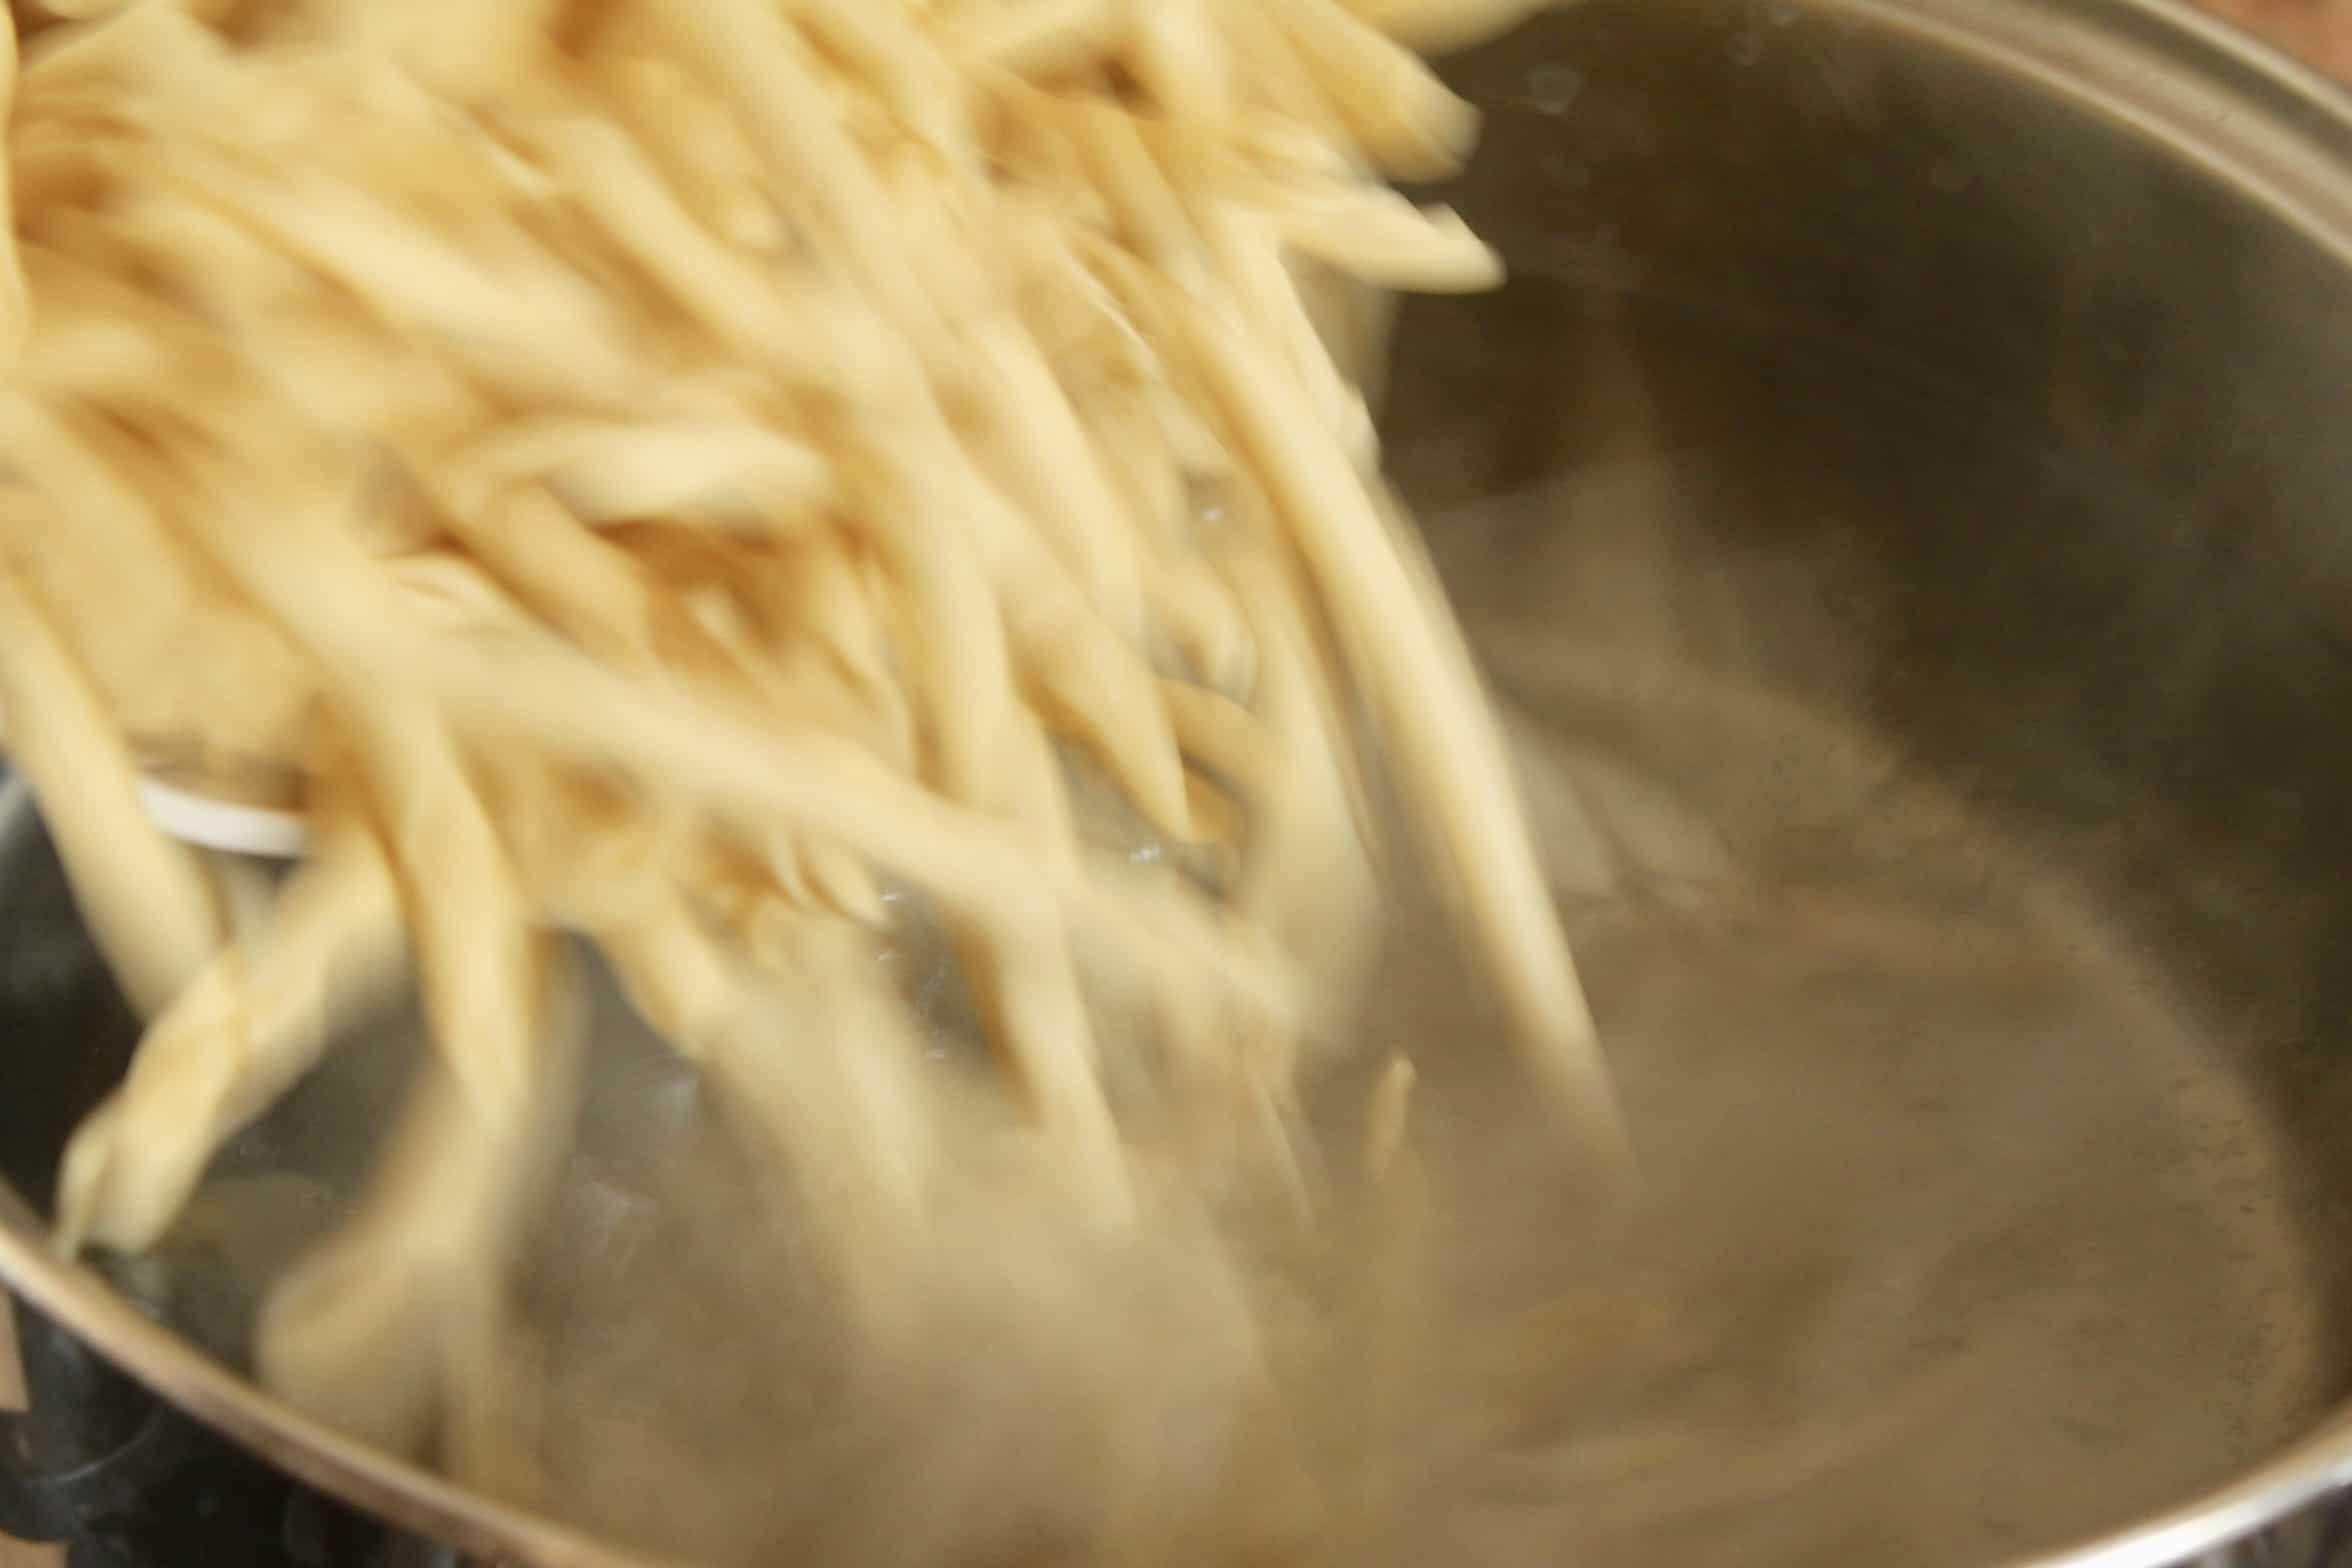 adding pasta to water